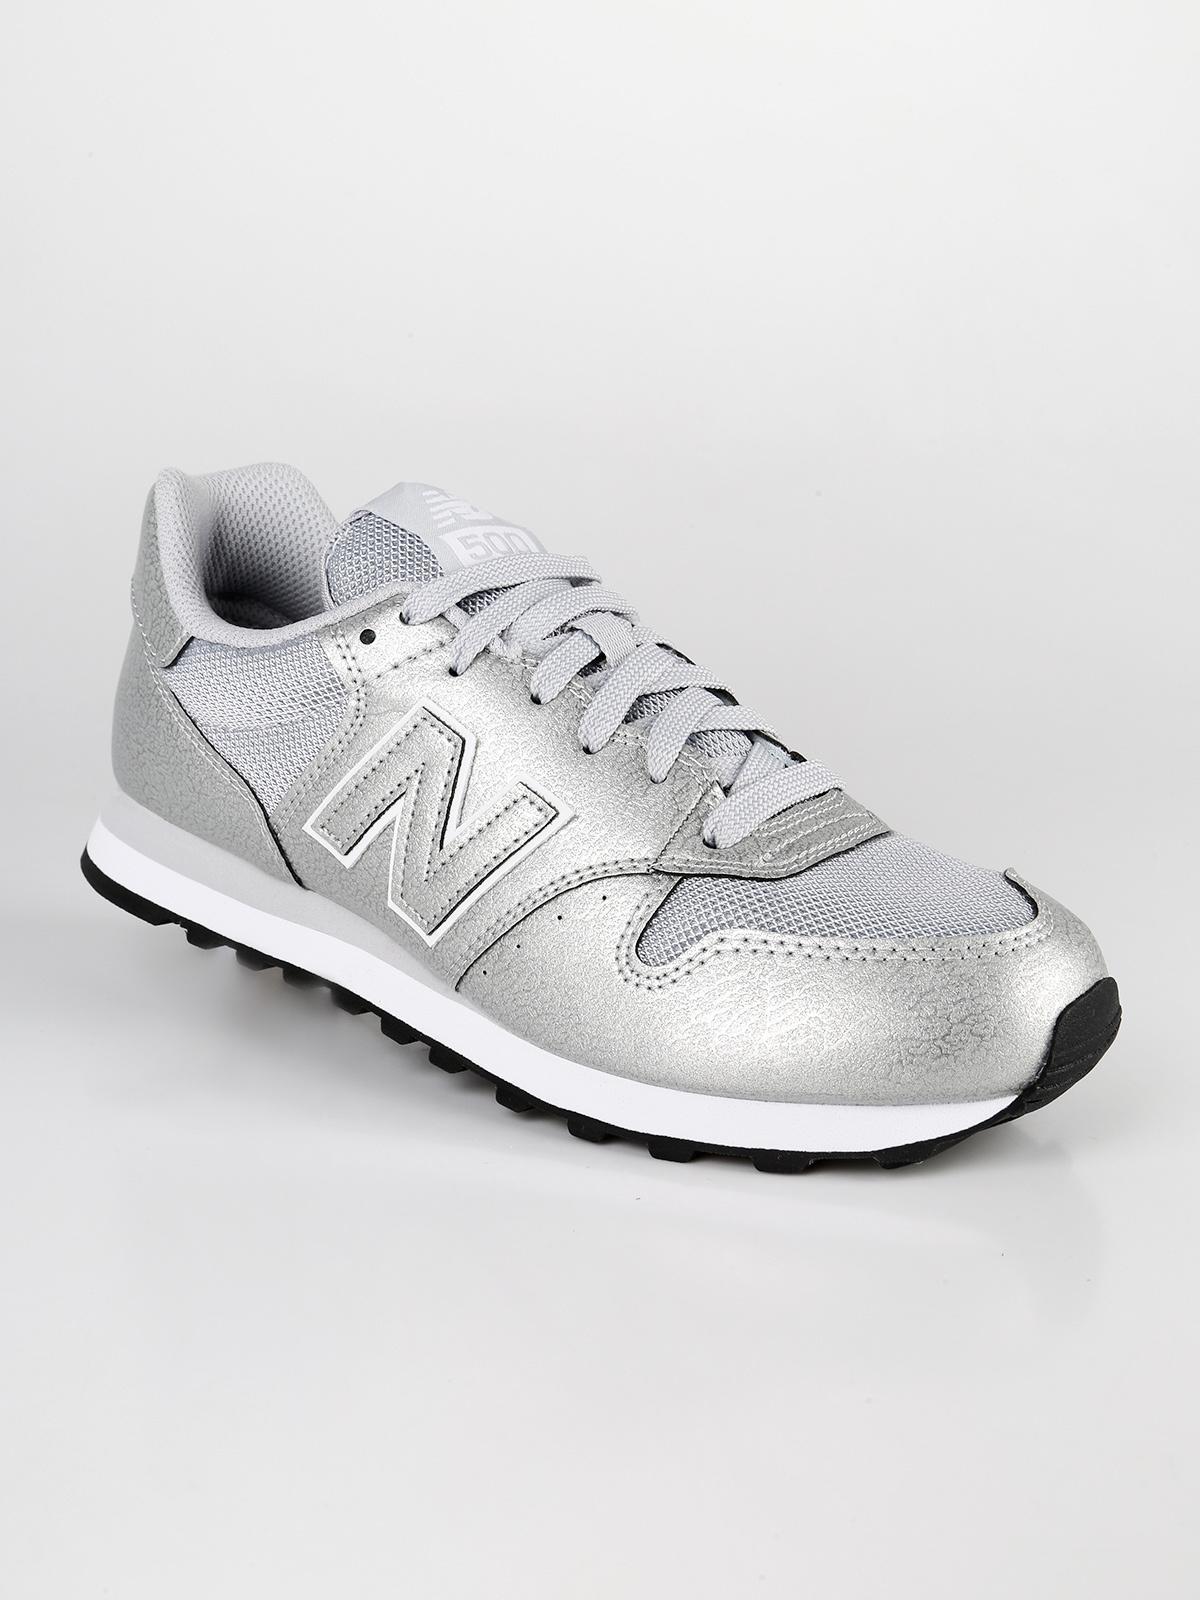 new balance argento e nero